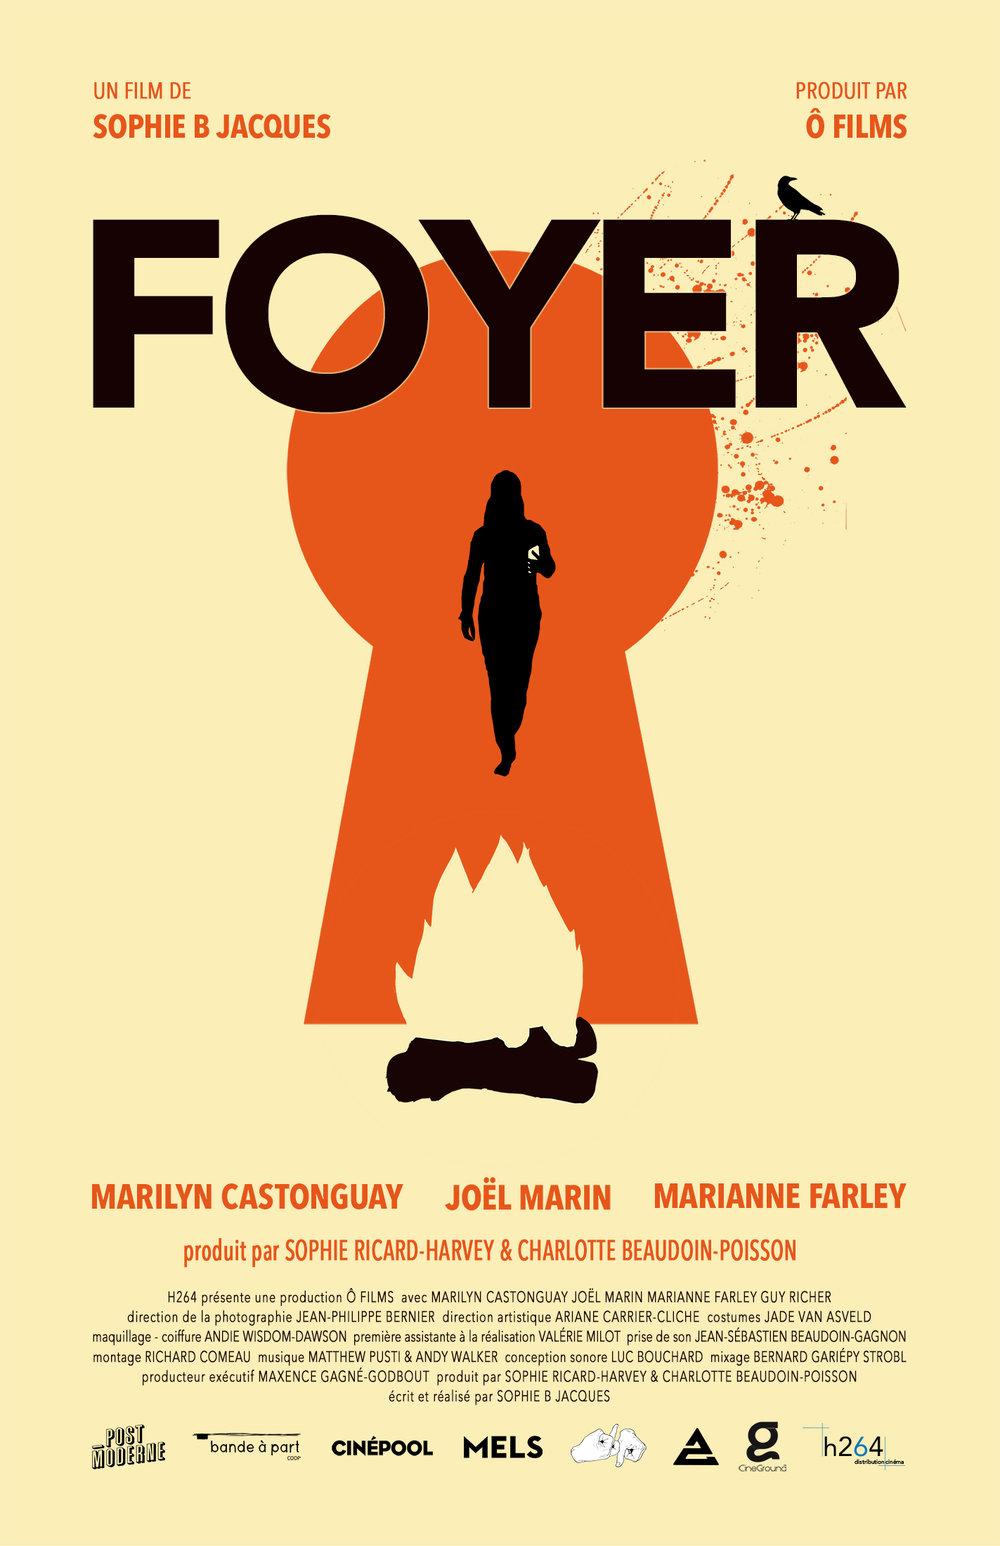 FOYER  - 11 min - fiction - 2018